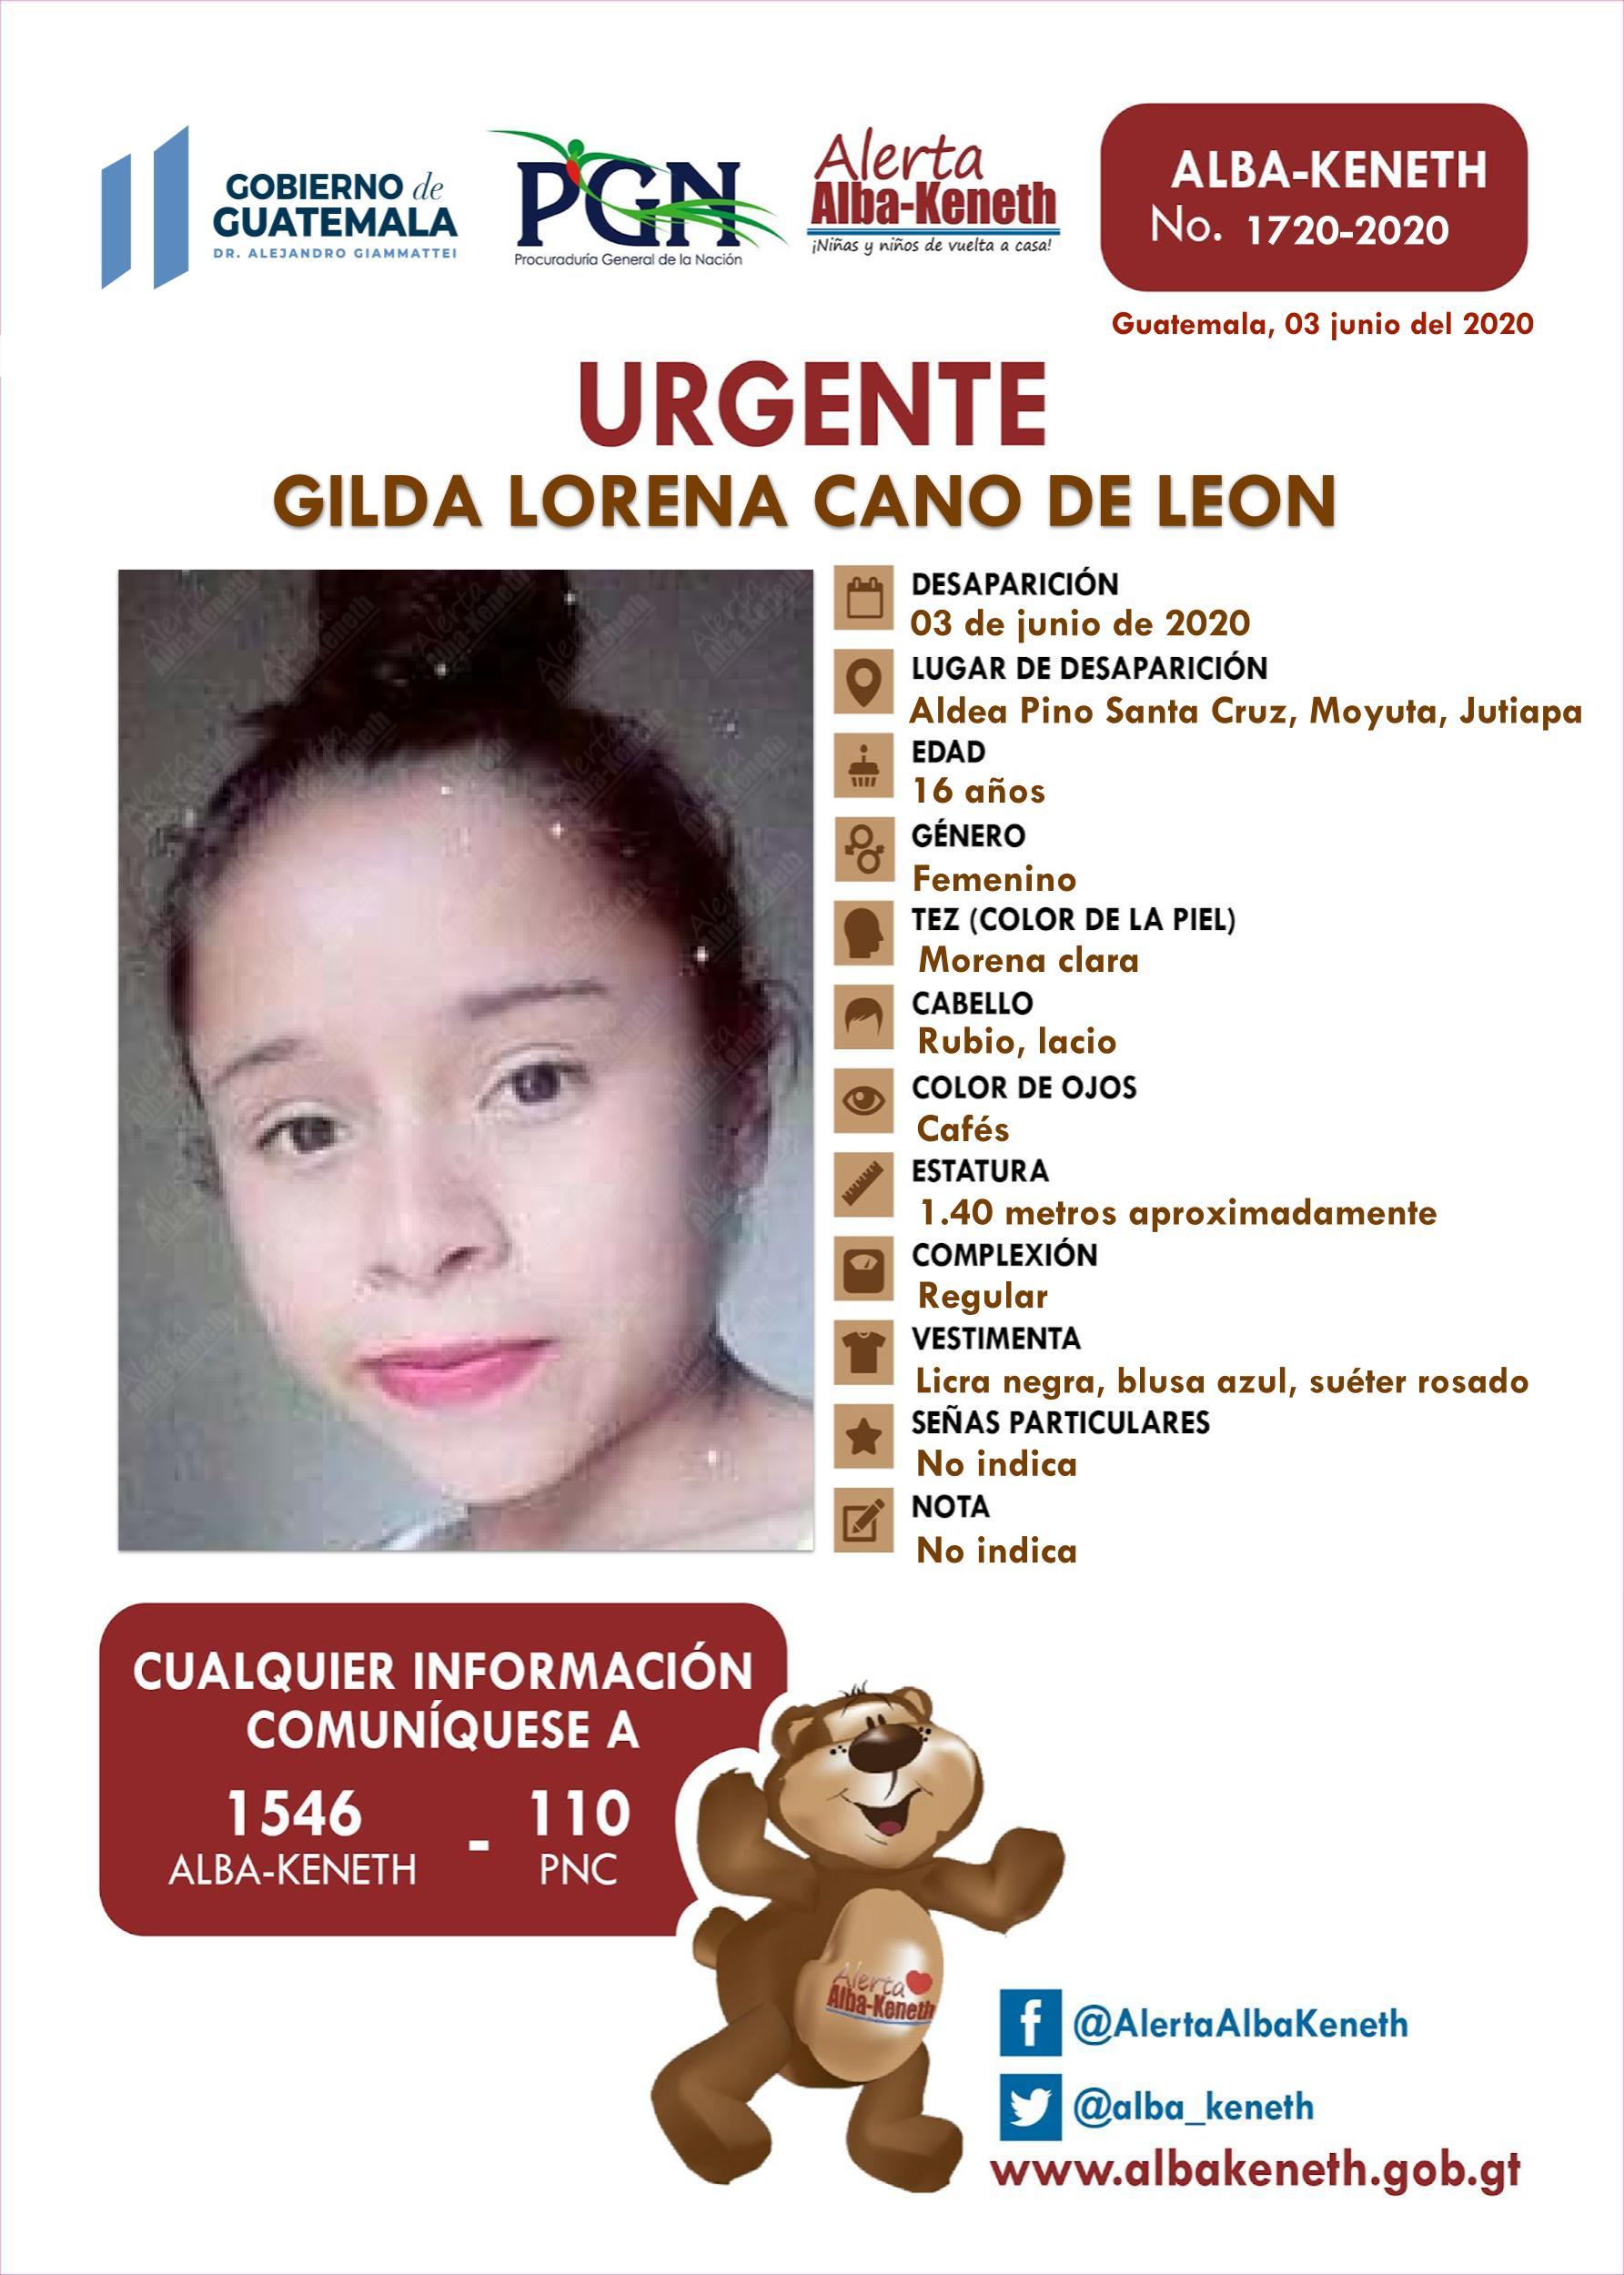 Gilda Lorena Cano de Leon